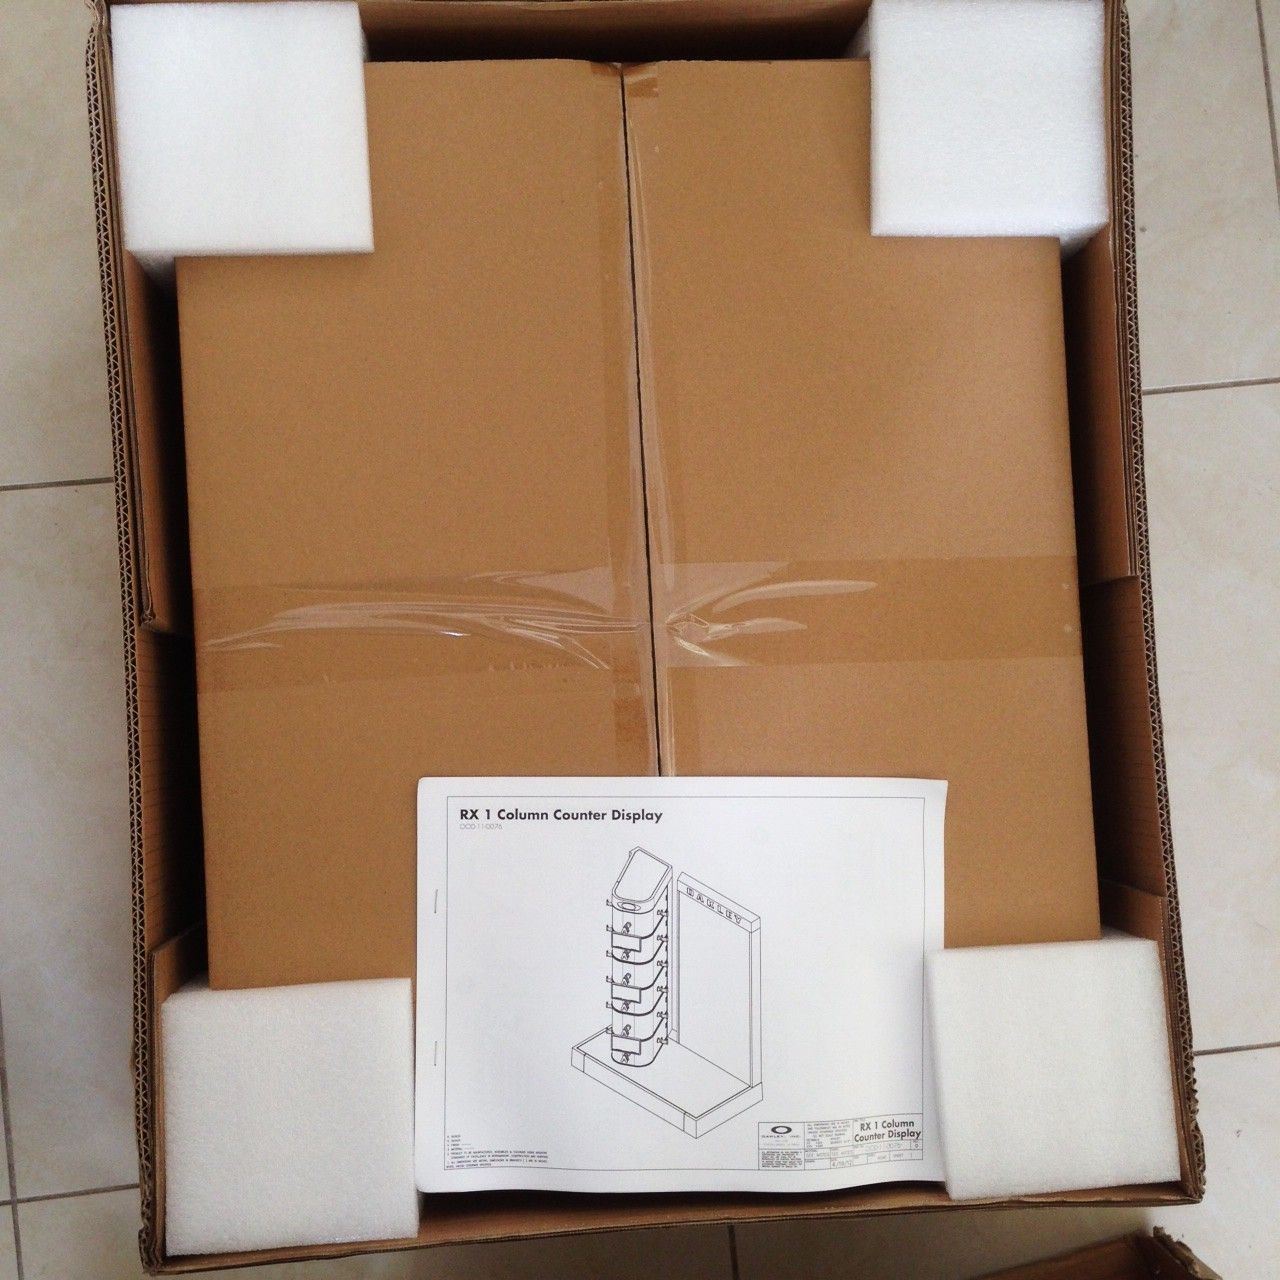 New in Box Oakley Counter Display - IMG_7804.JPG